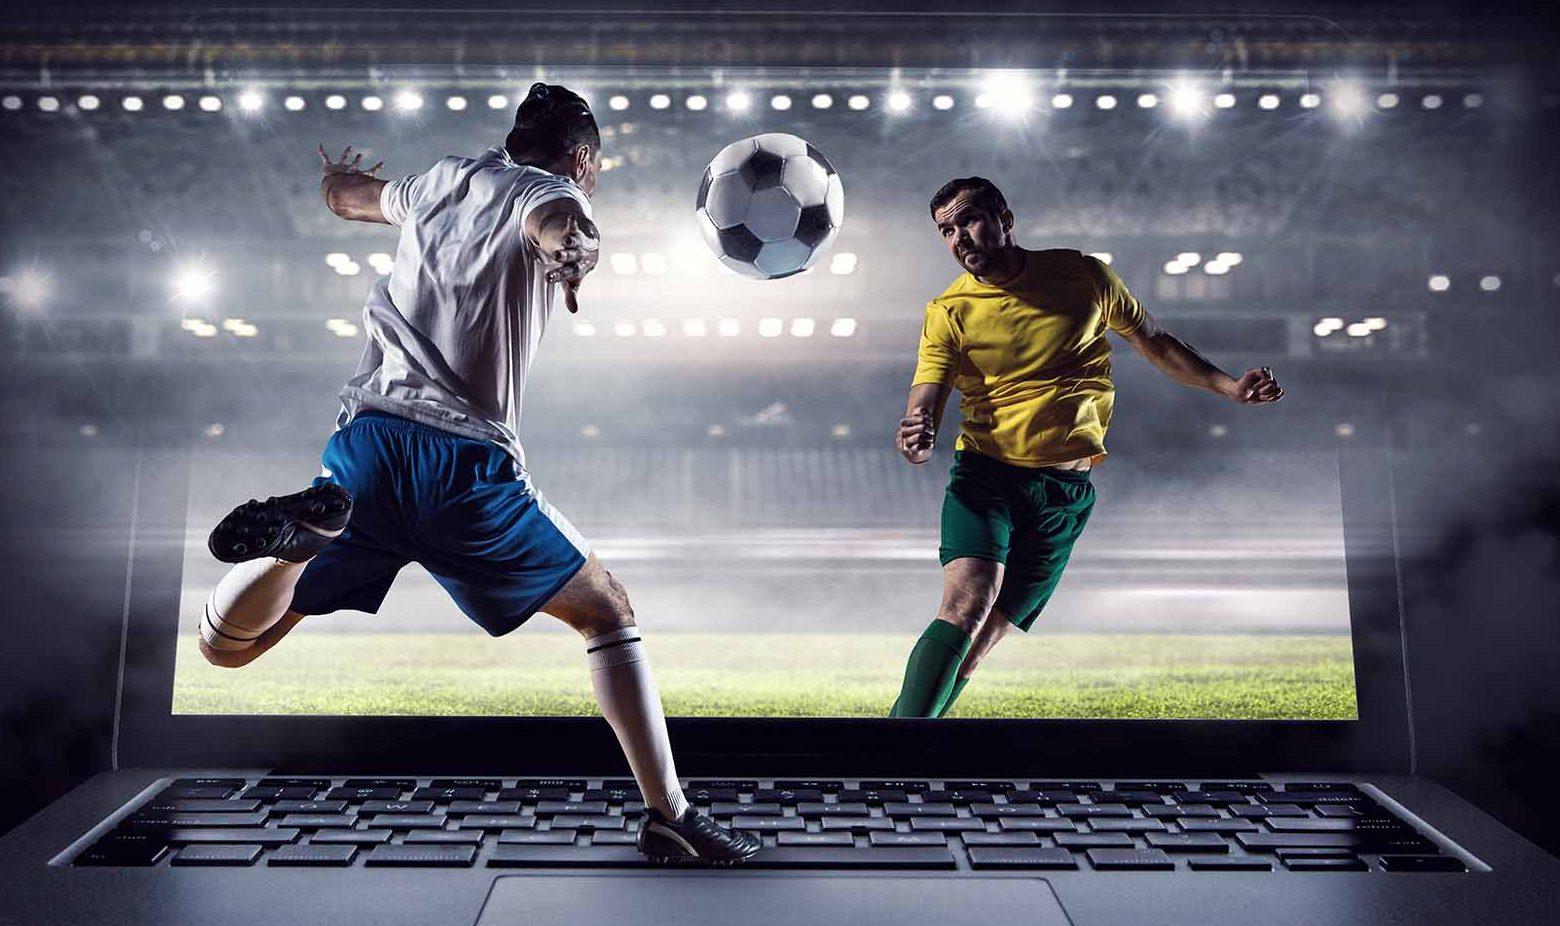 Спортивные матчи и лайв ставки в БК Фавбет